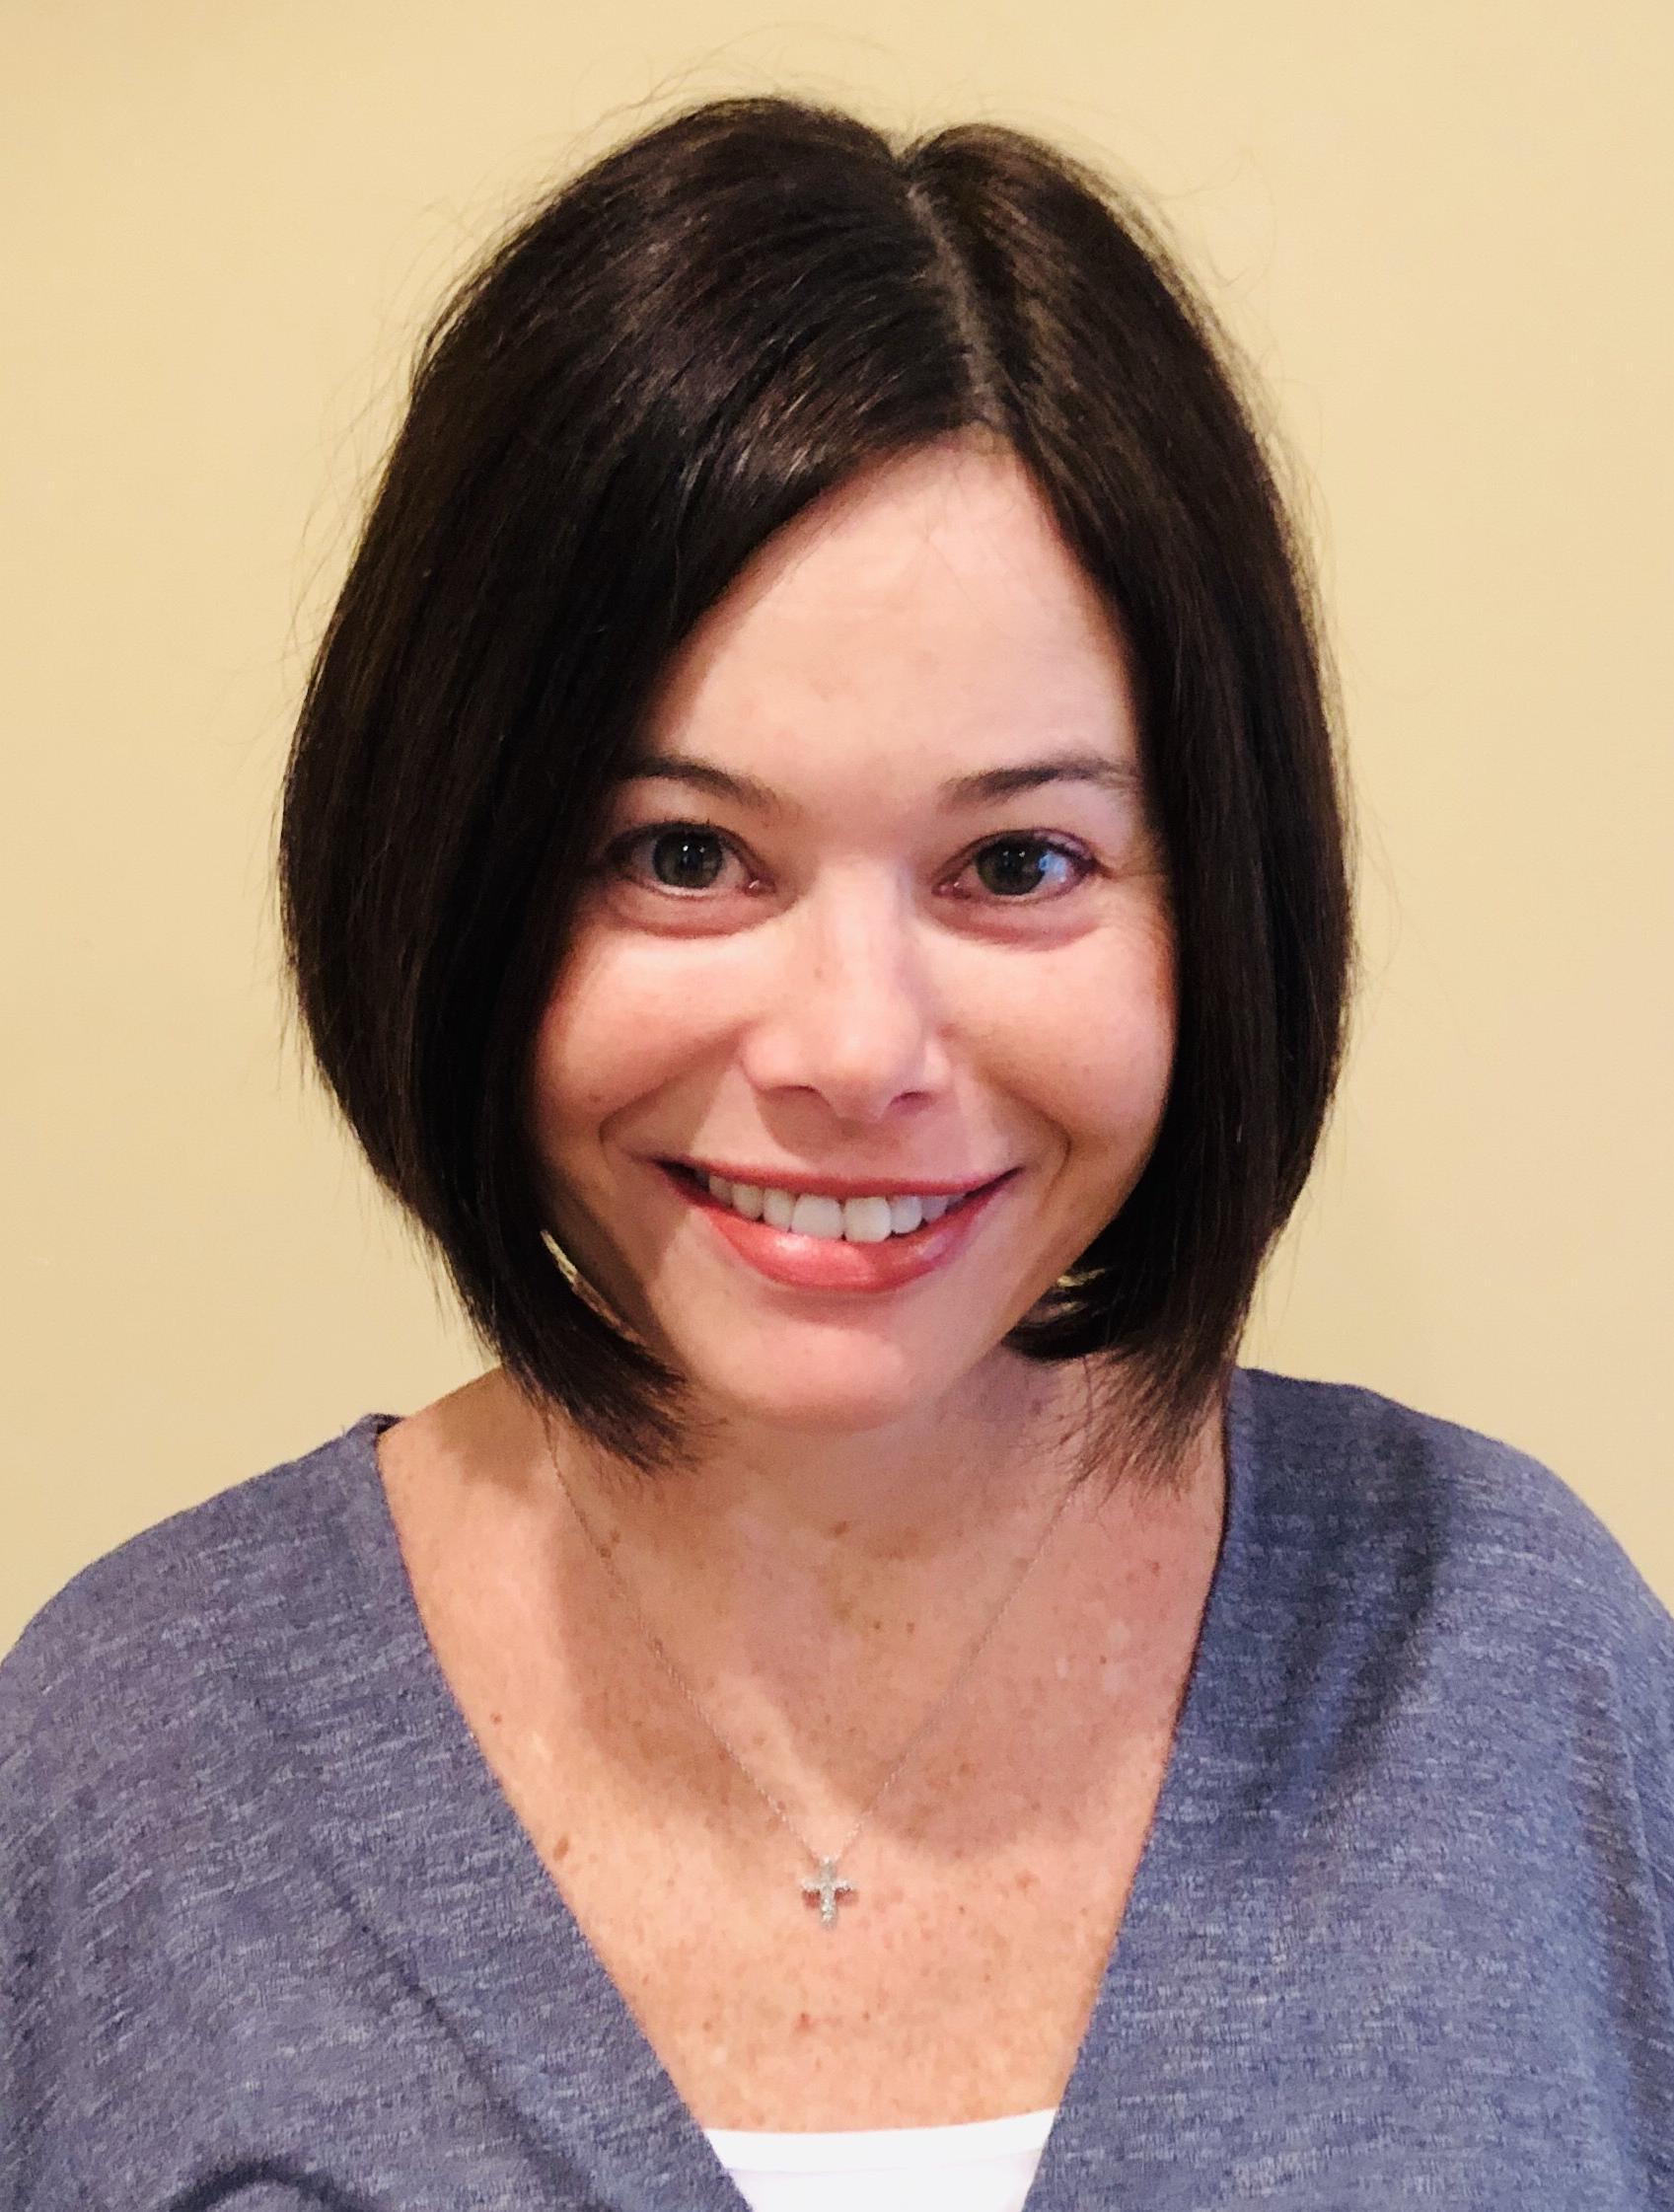 Kelly Peel, Elementary Math Specialist